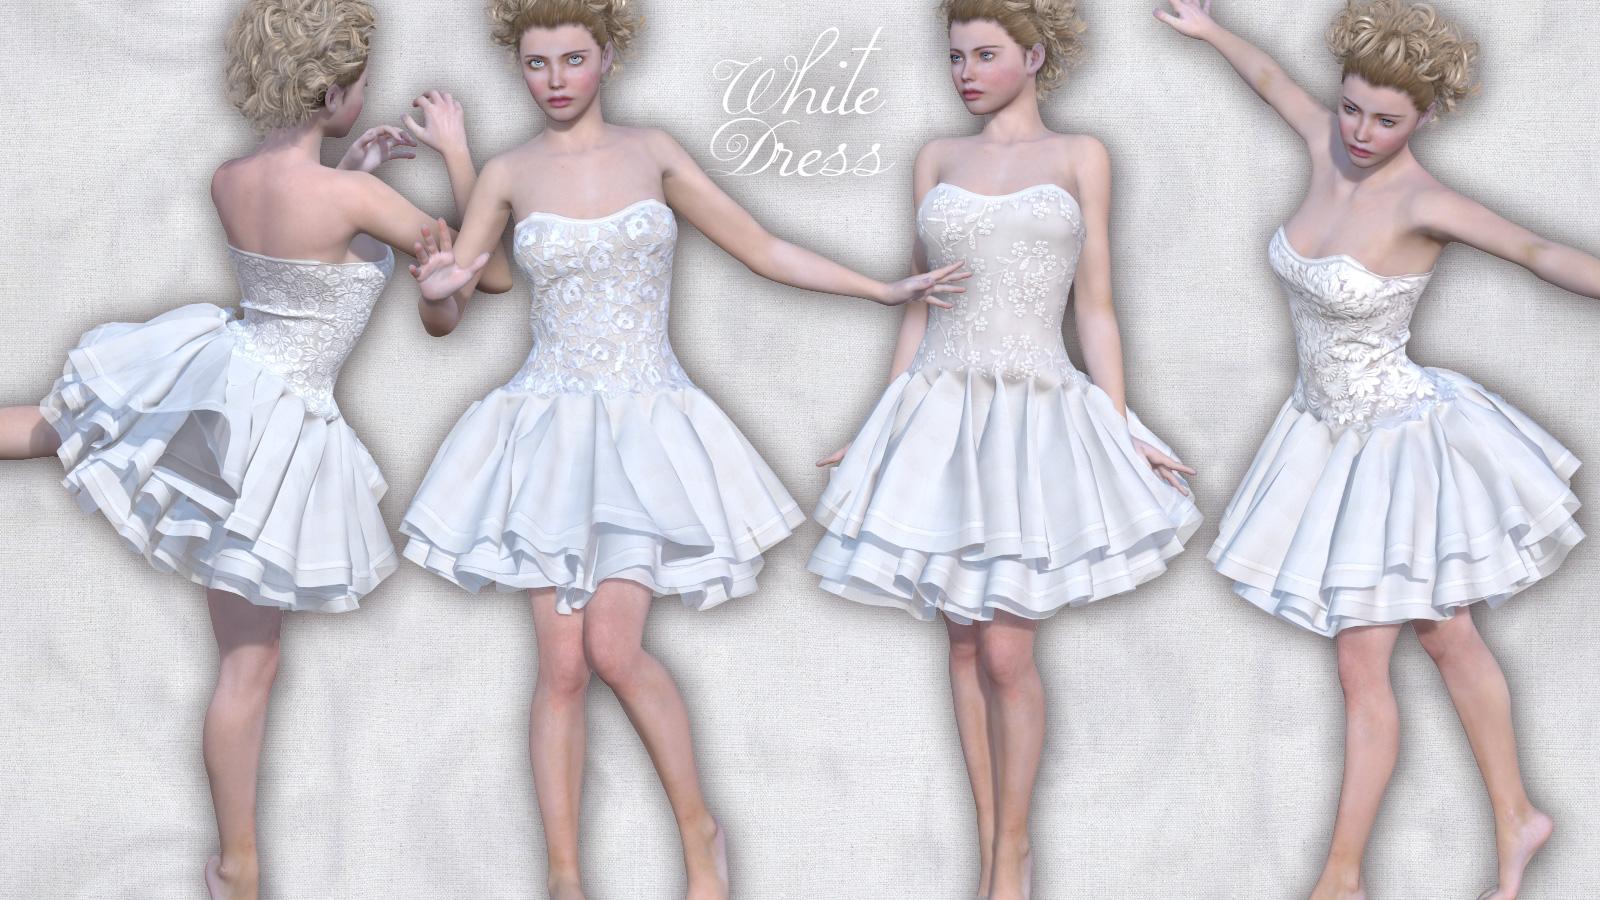 Whitedresspromo1600x900